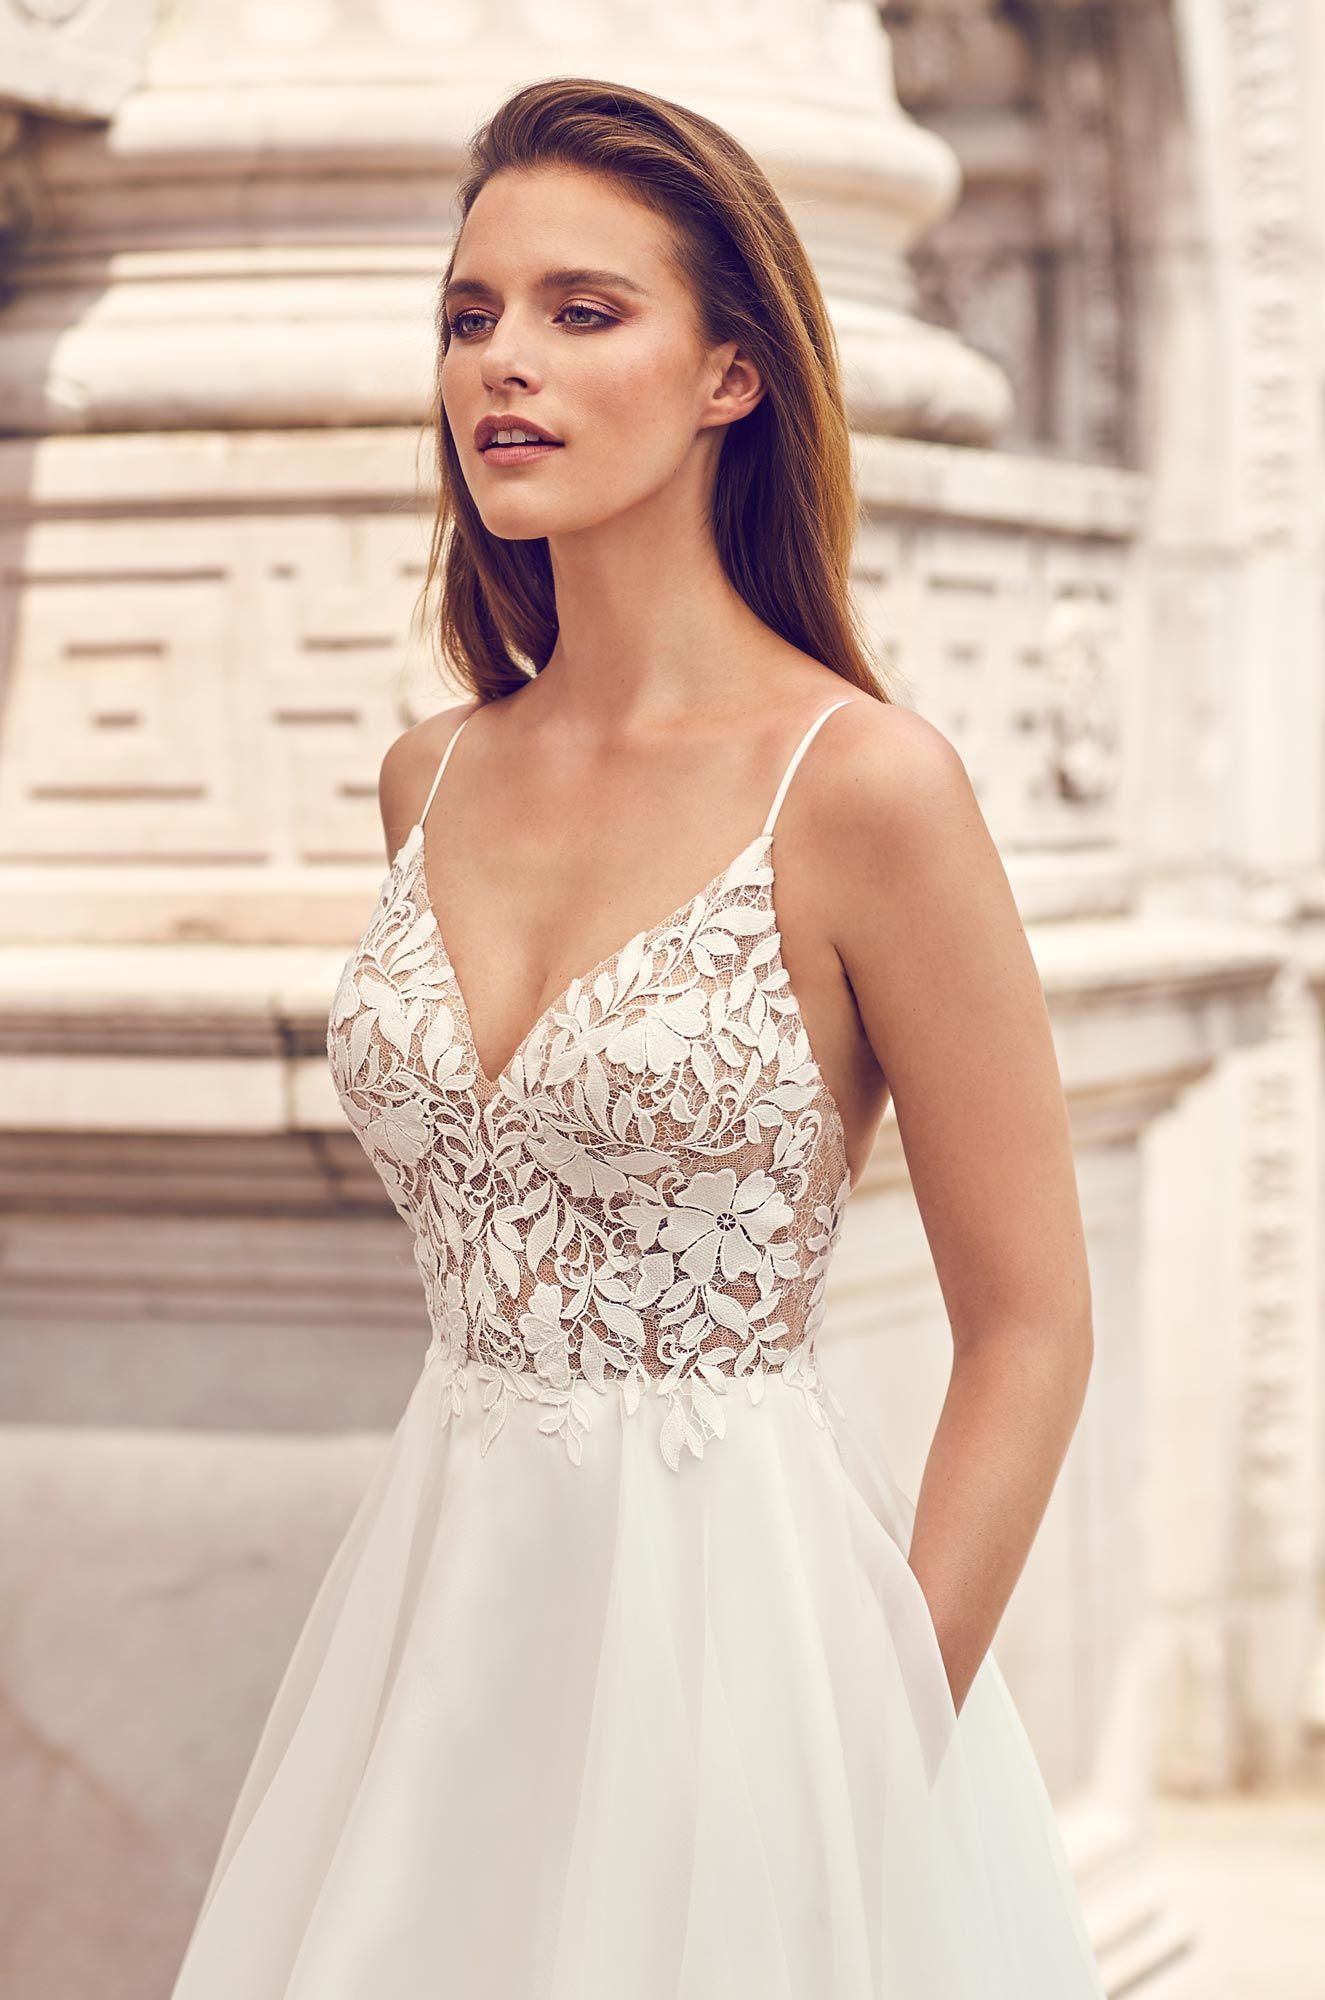 Romantic Lace Bodice Wedding Dress – Style #2225 | Mikaella Bridal